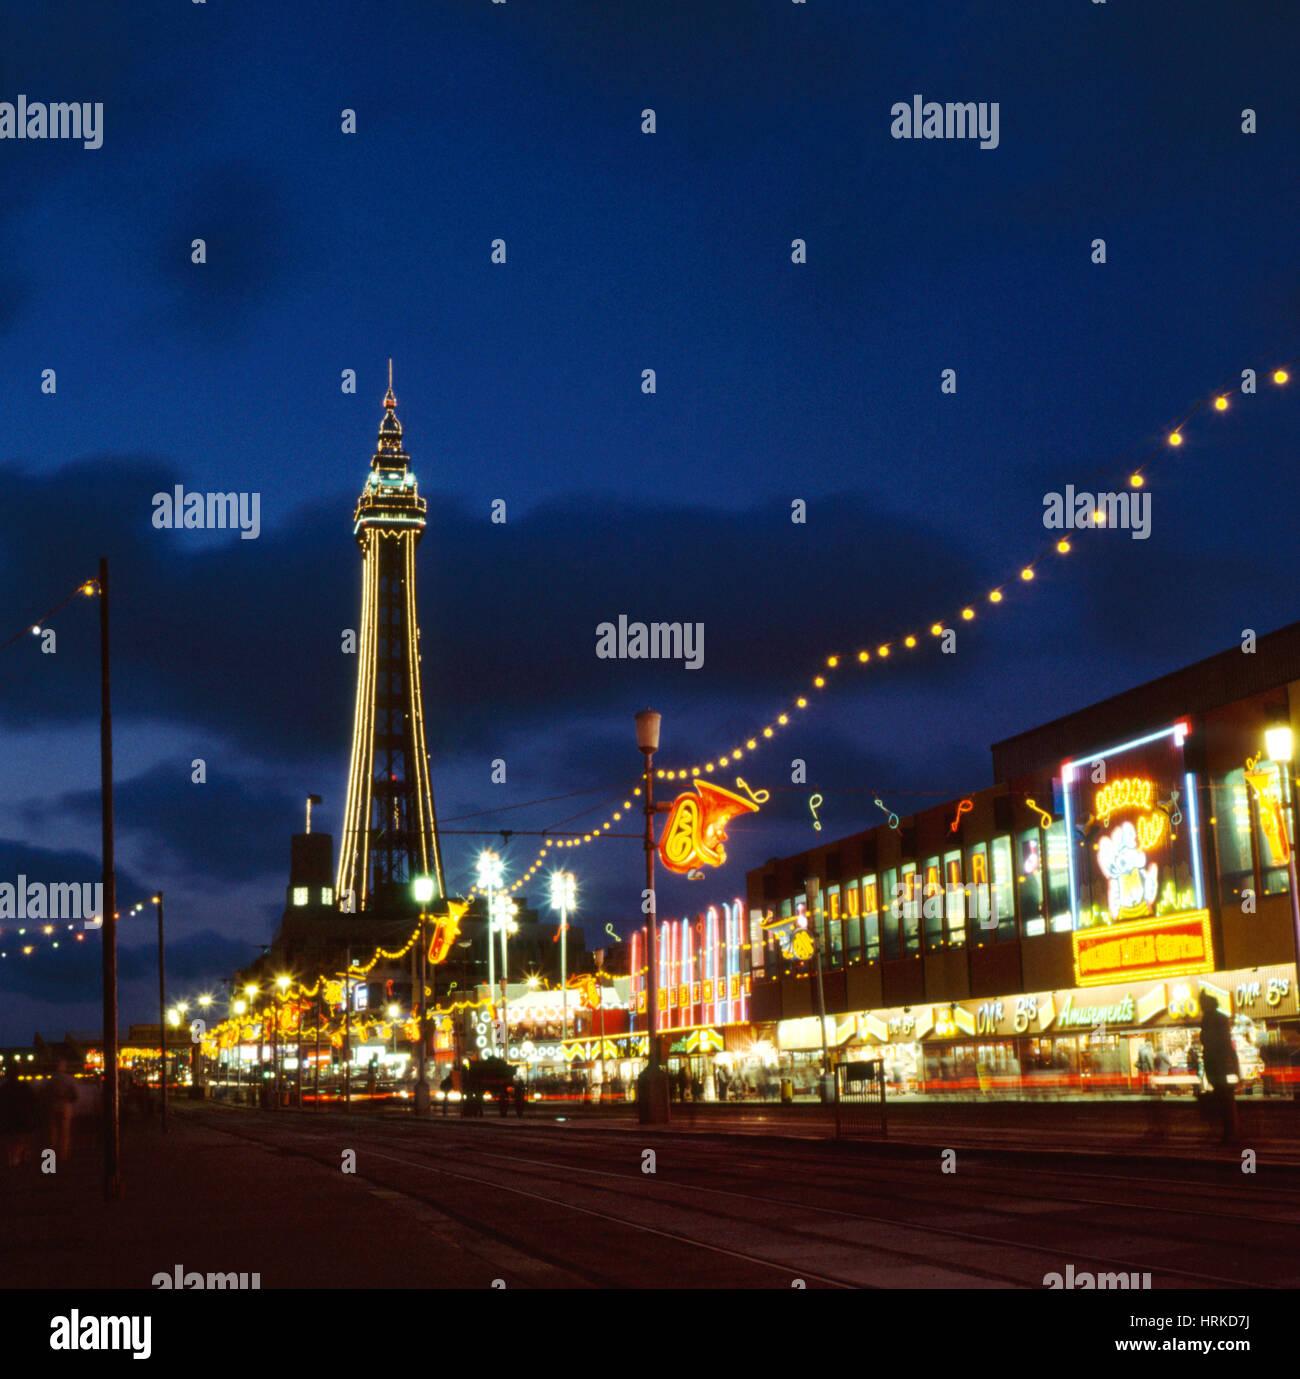 Blackpool Tower and the promenade at night, Lancashire, UK. - Stock Image